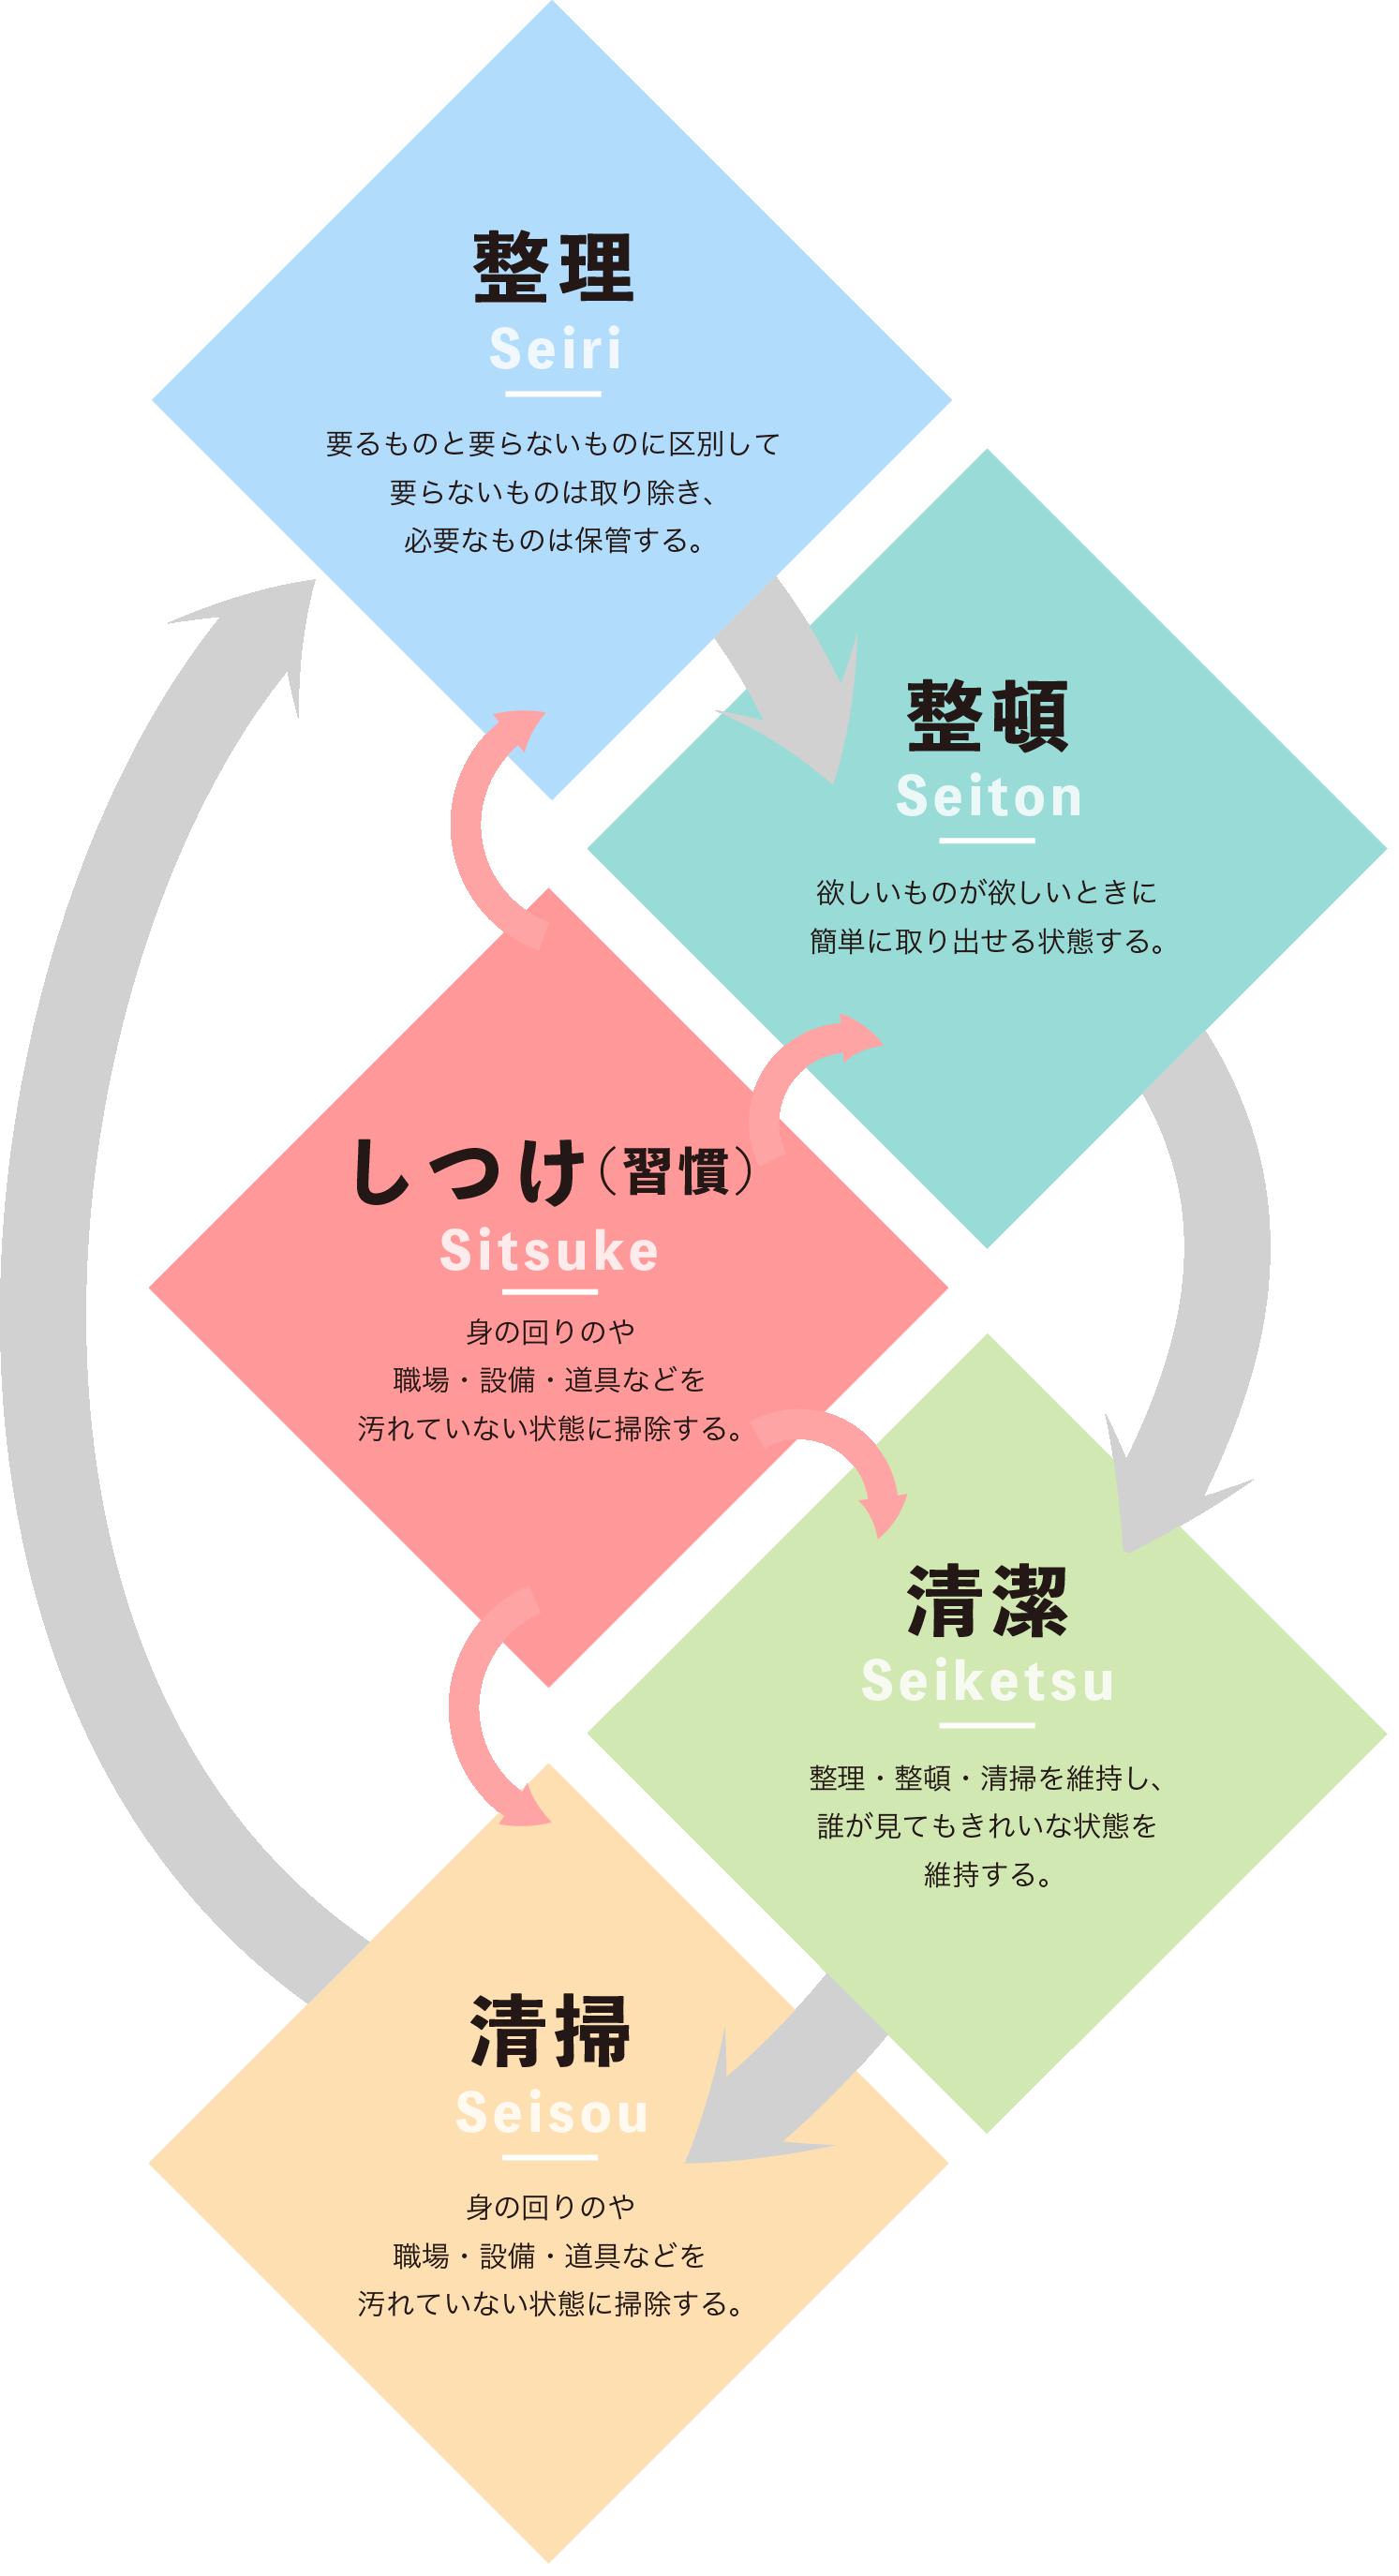 5S活動・QCサークル活動 | 株式会社山製作所